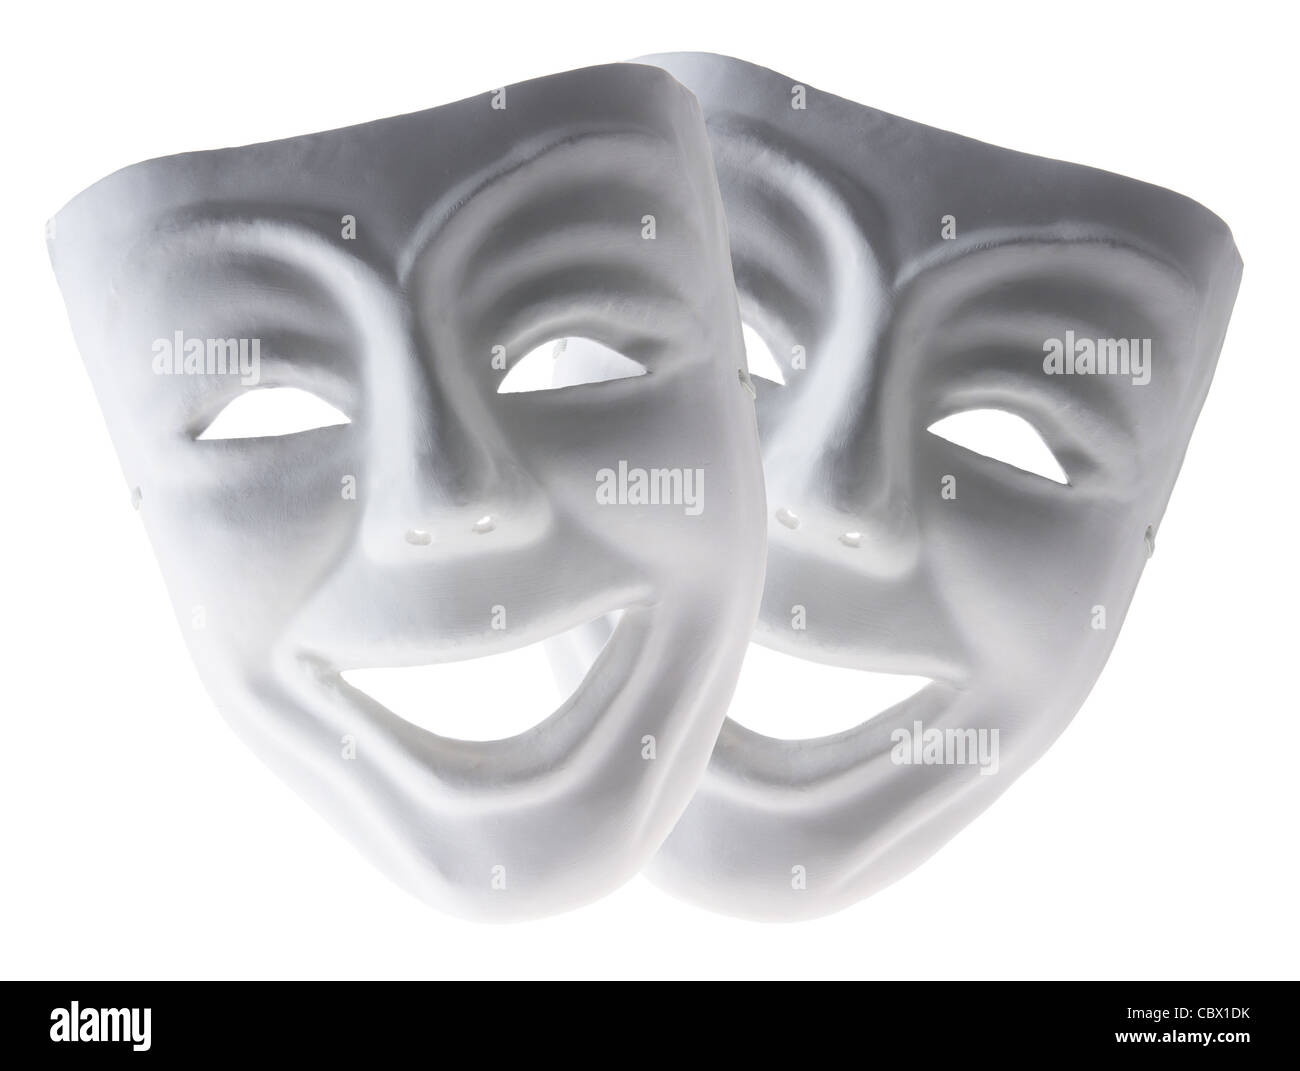 Masques faciaux Photo Stock